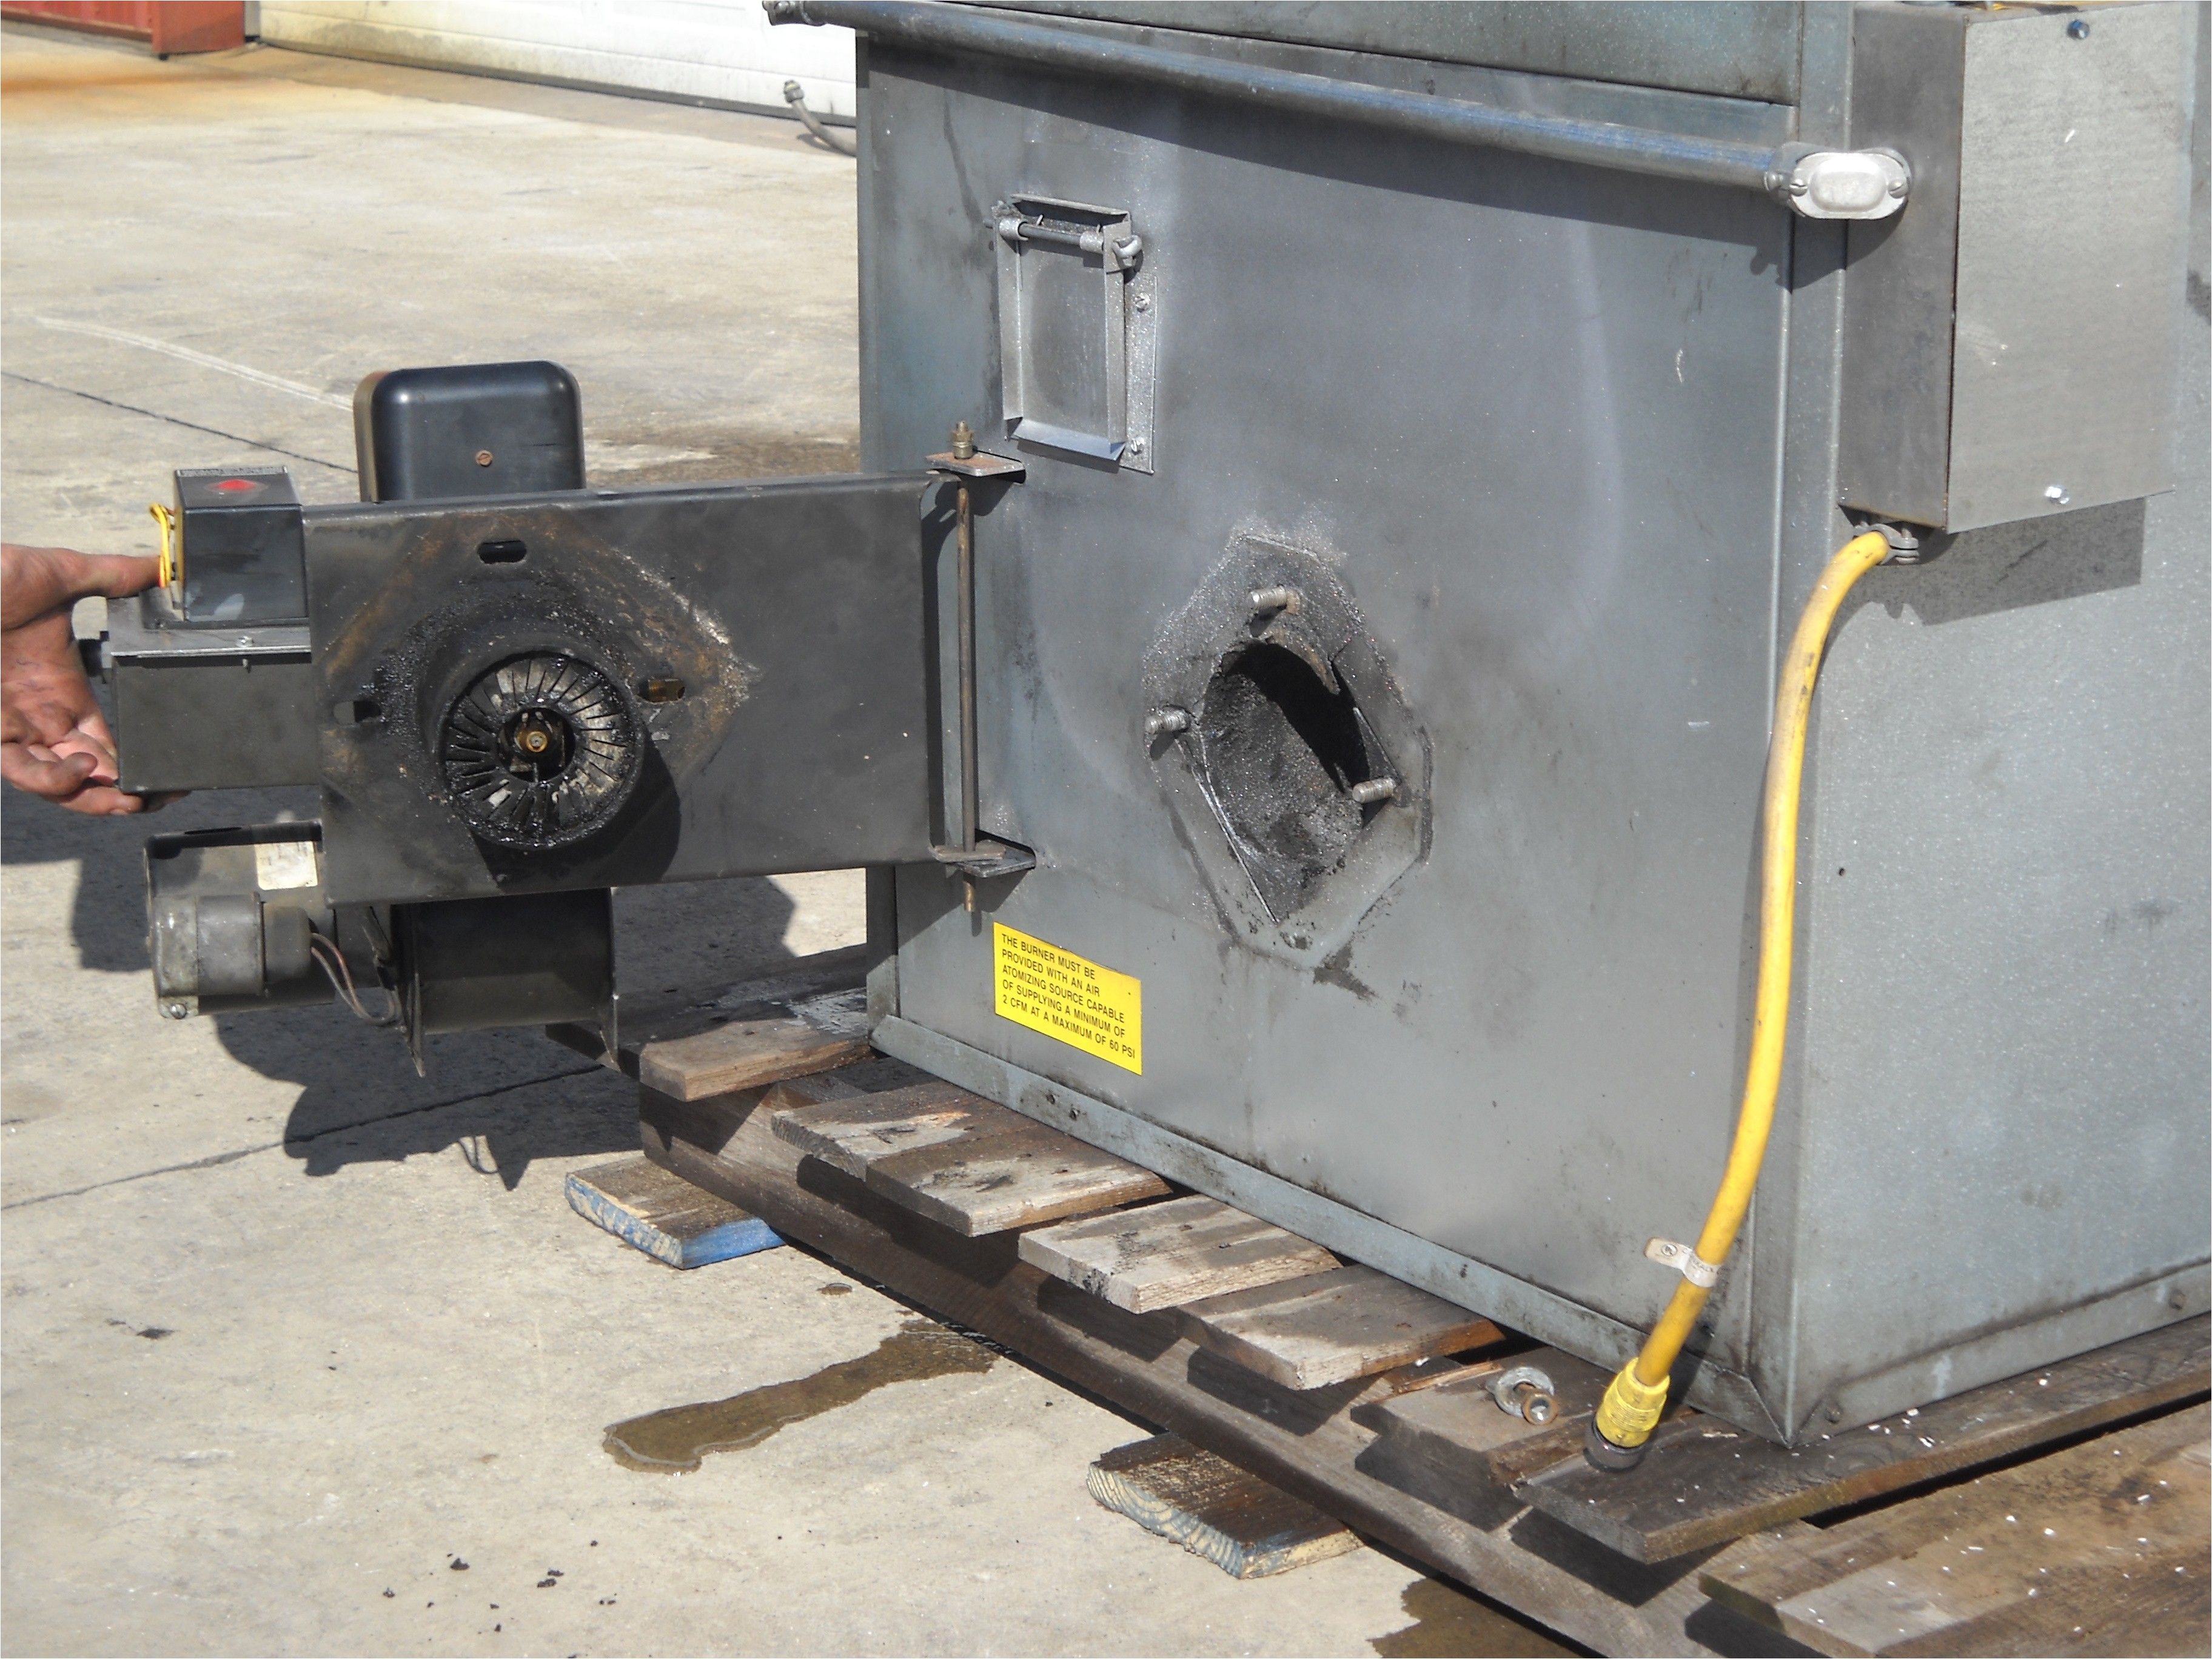 Lanair Waste Oil Heater Troubleshooting Adinaporter